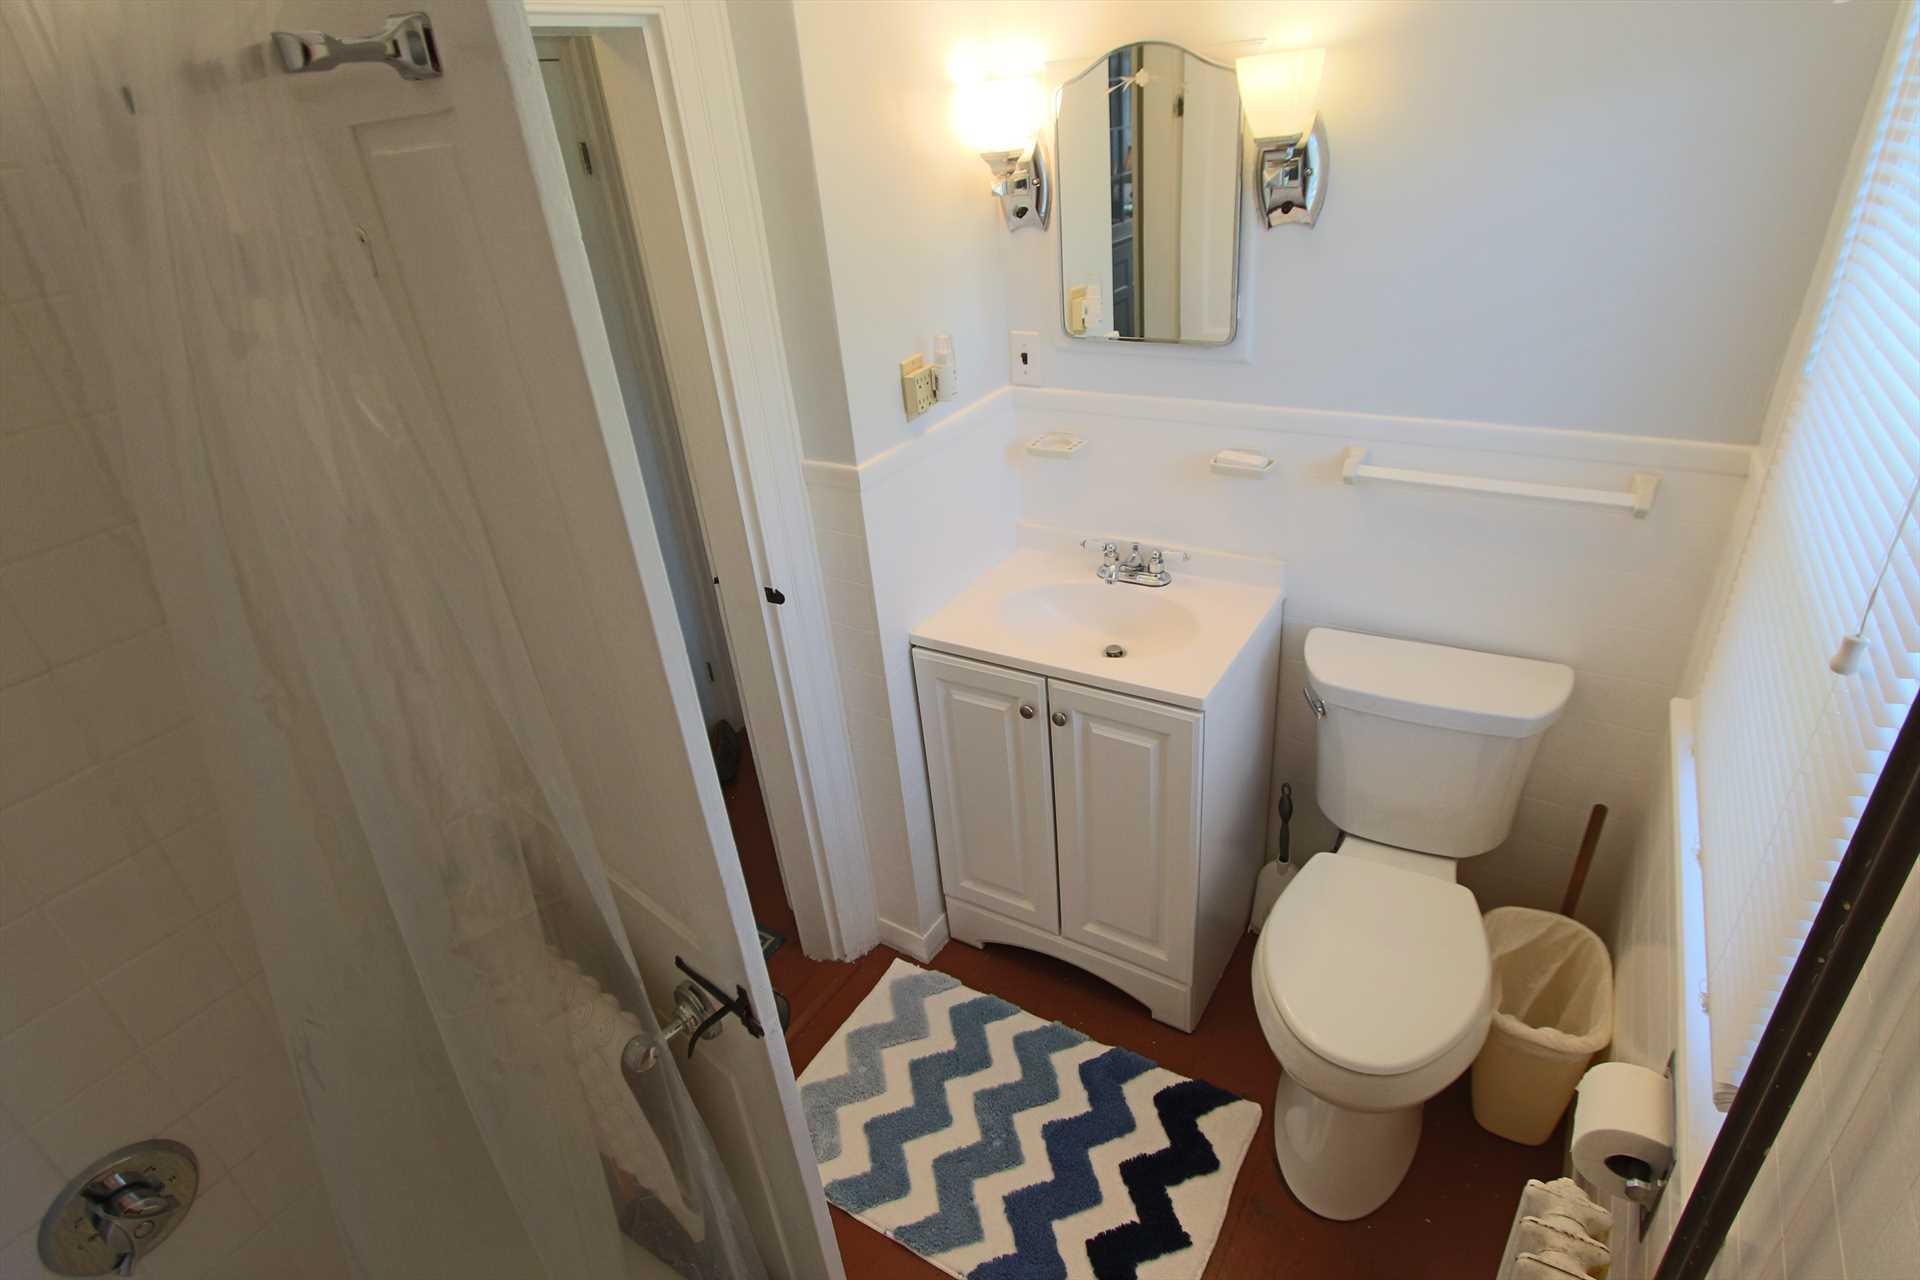 Bathroom - 1st Floor - Tub & Shower